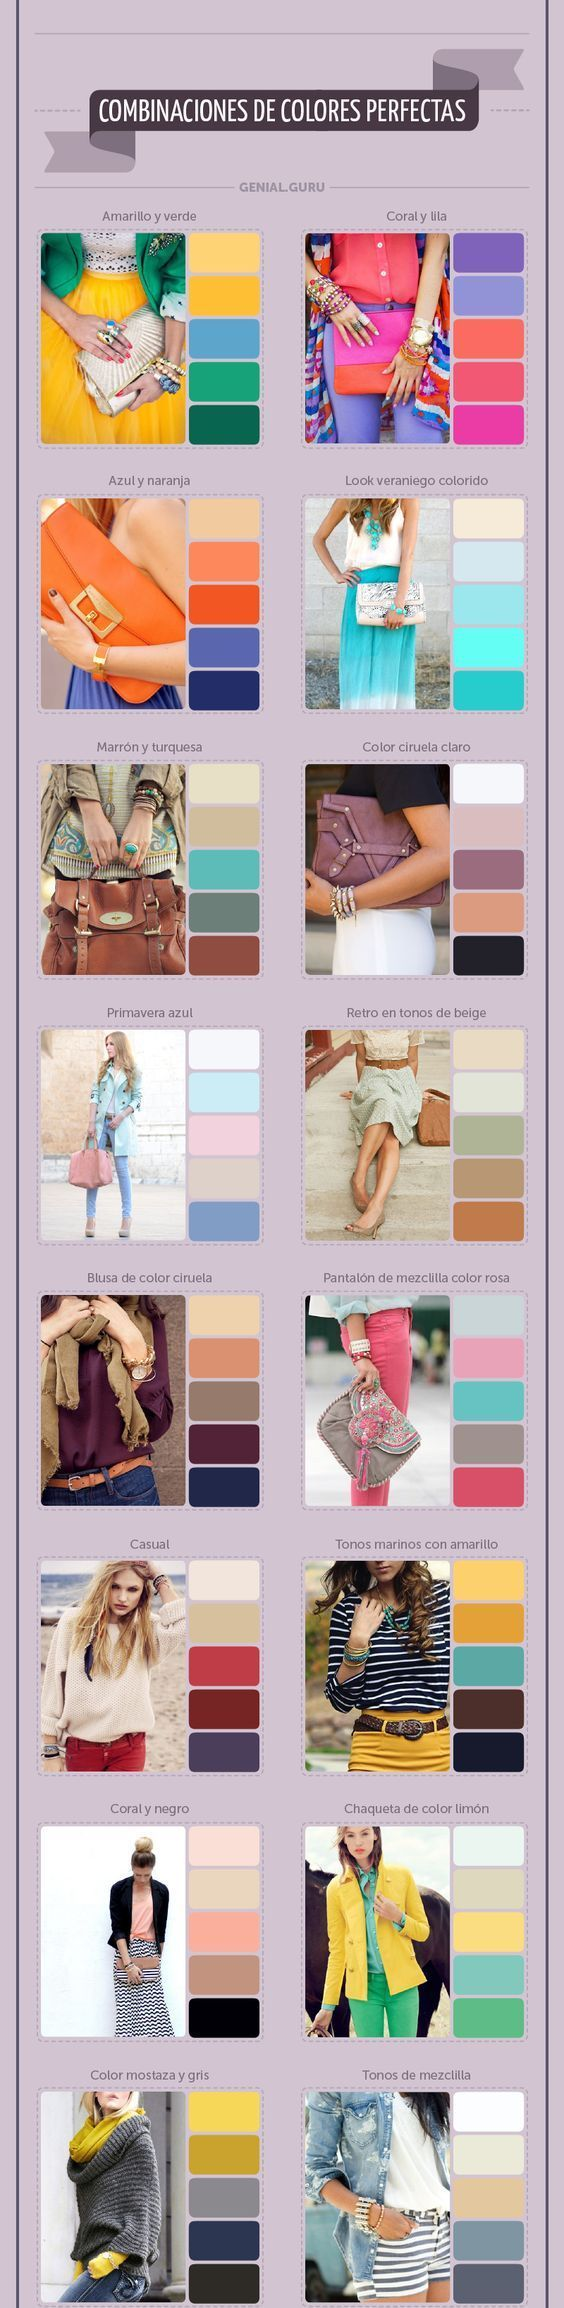 informal dresses color combos 10 best outfits